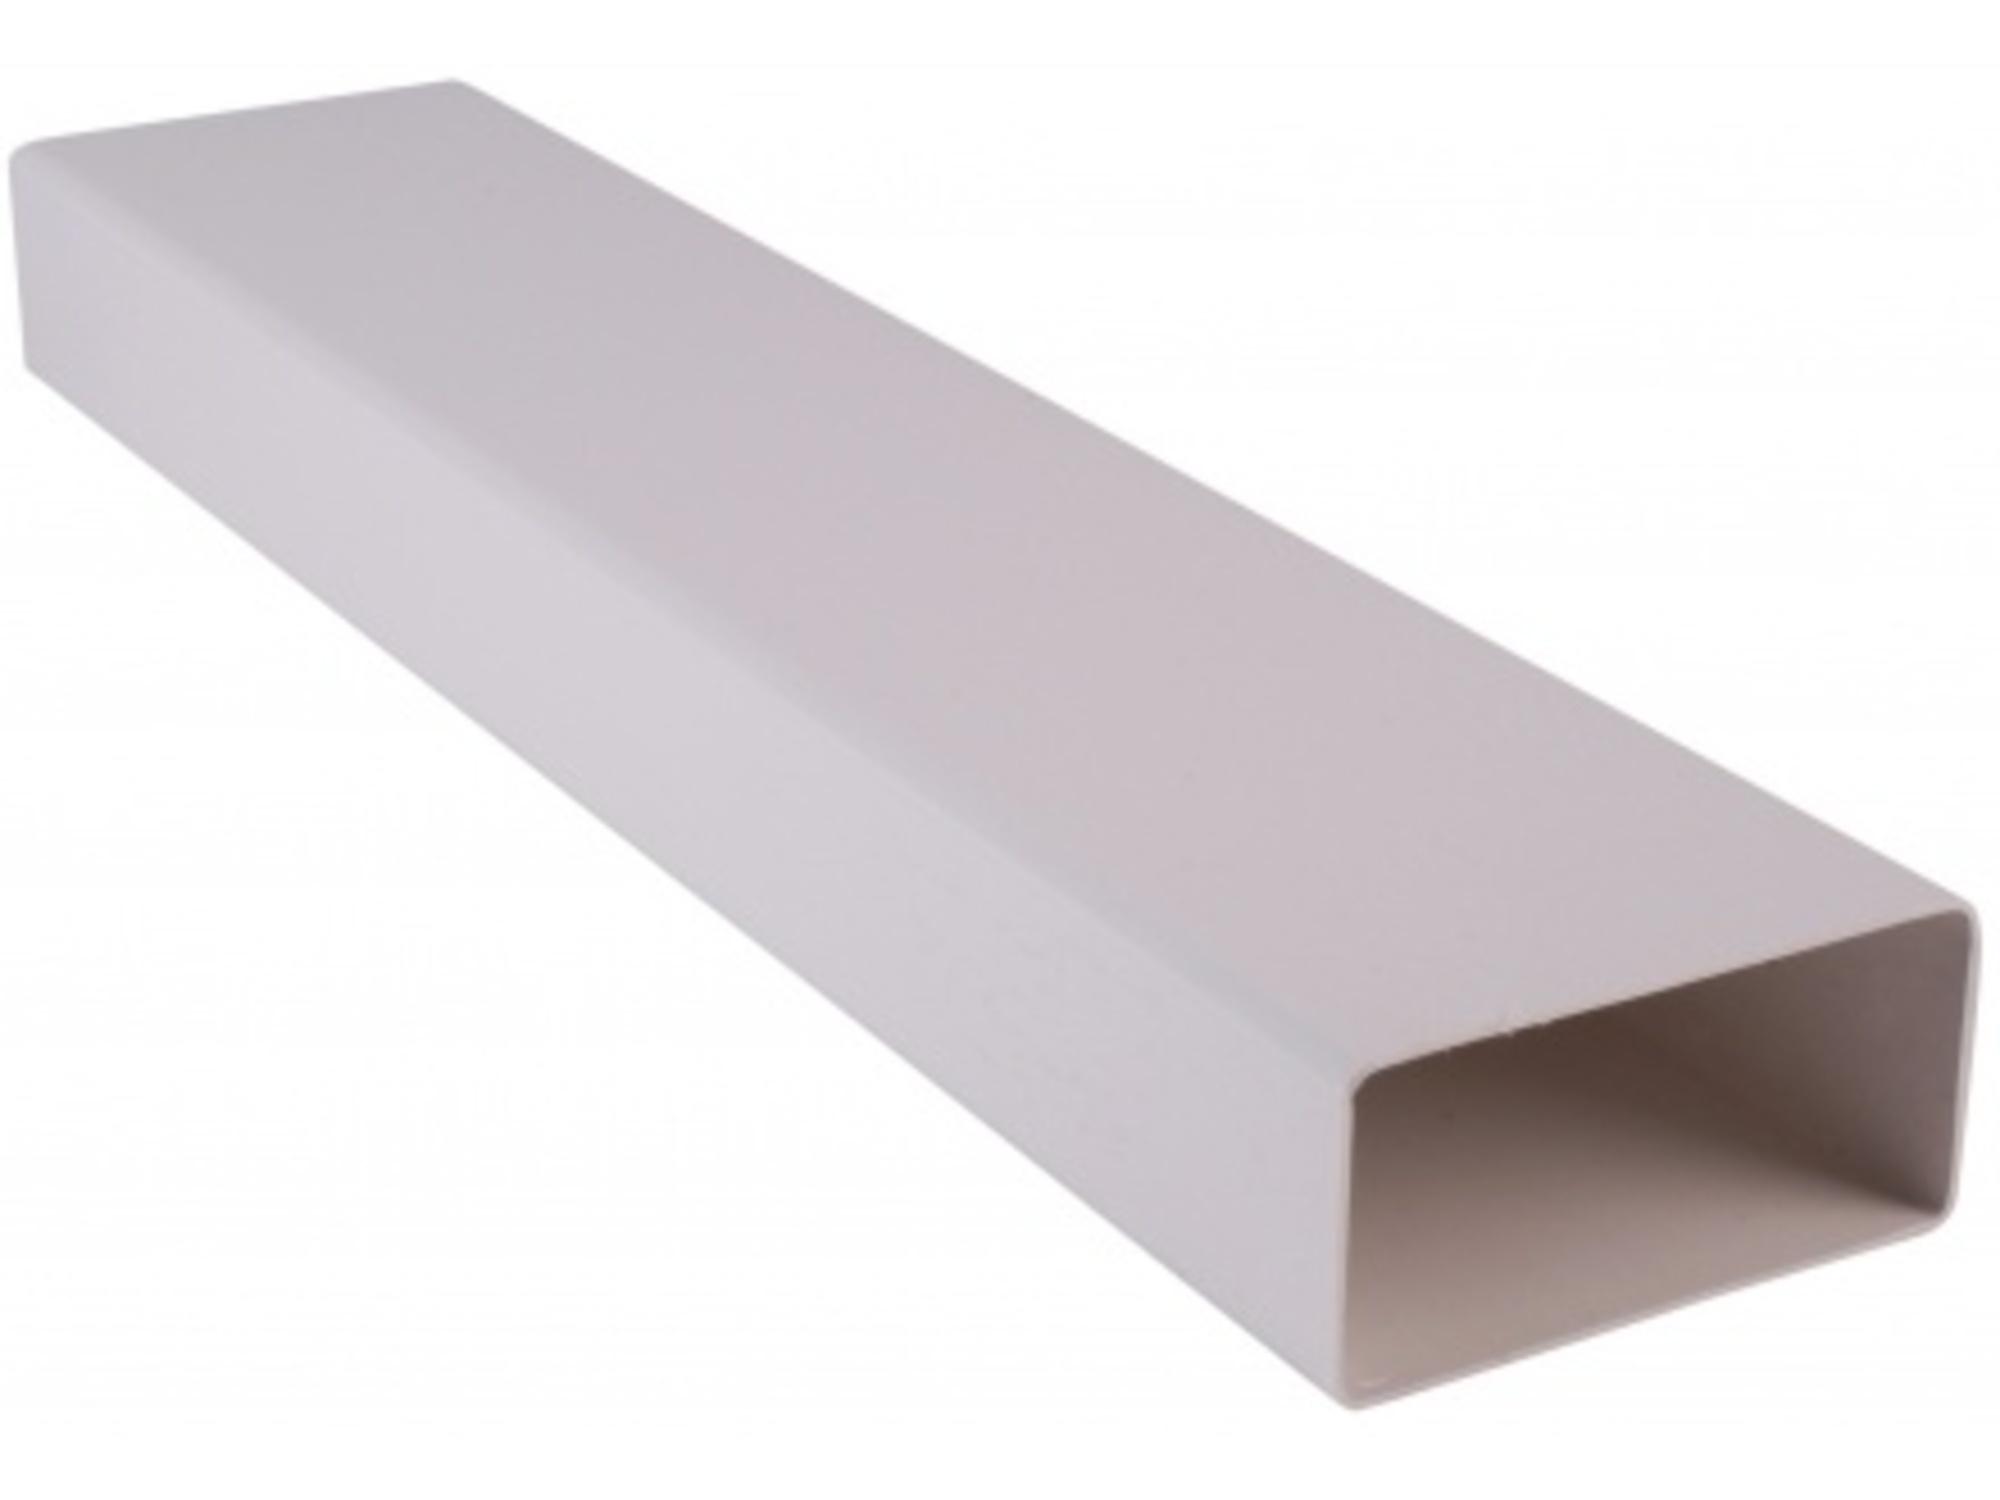 ETISAIR pravokotna cev za nape 1m 220x90 mm 137145